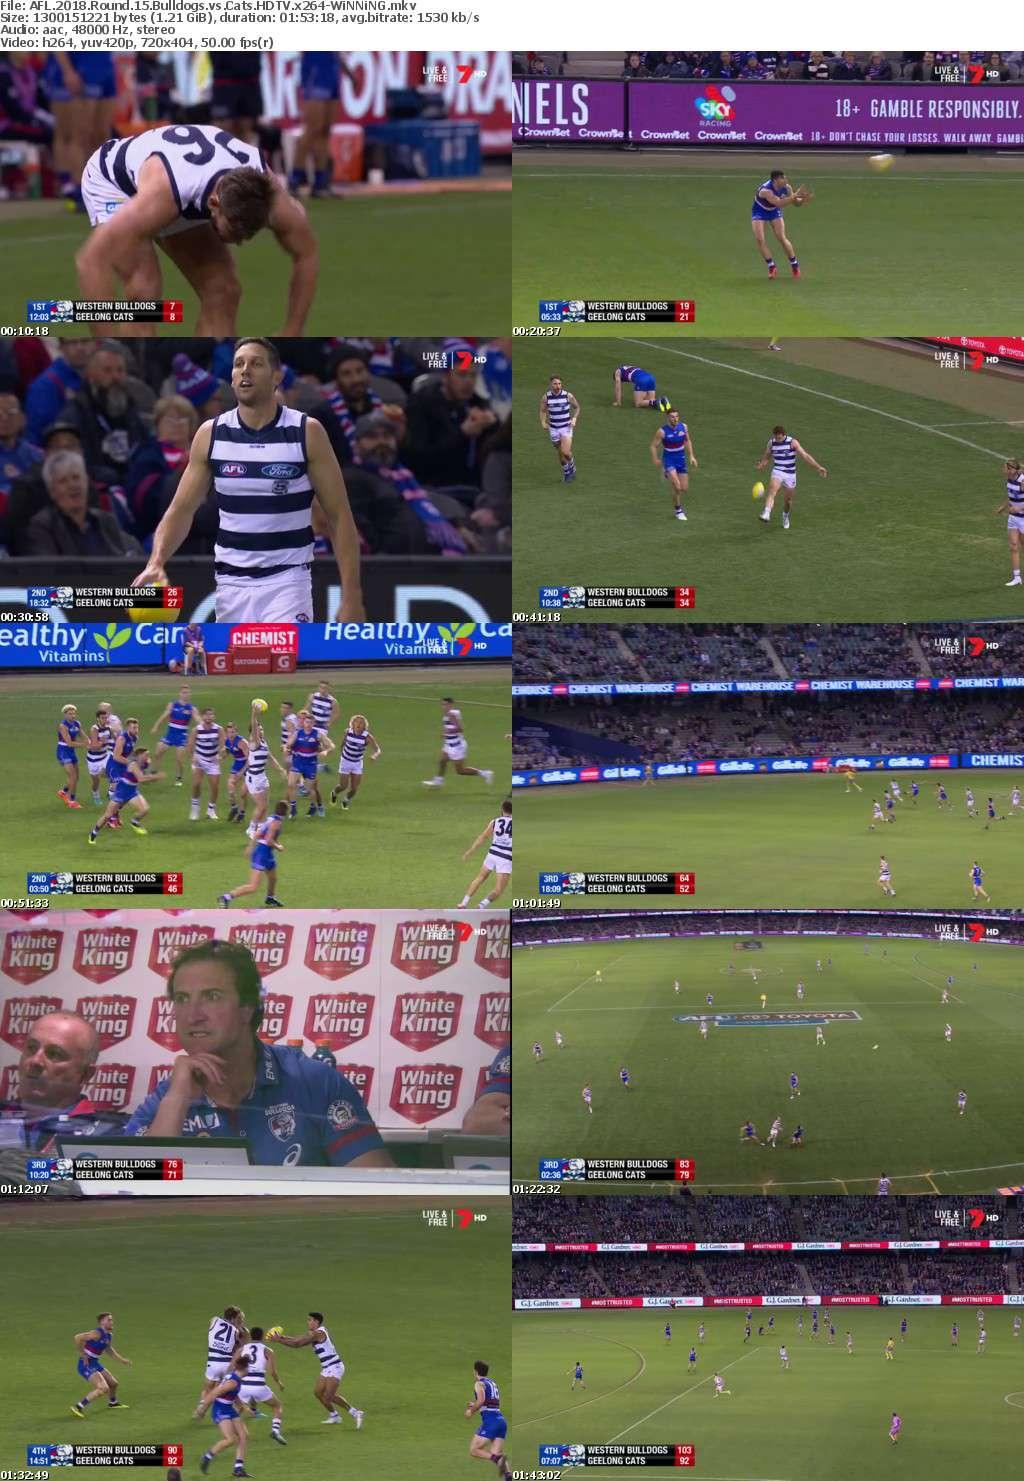 AFL 2018 Round 15 Bulldogs vs Cats HDTV x264-WiNNiNG